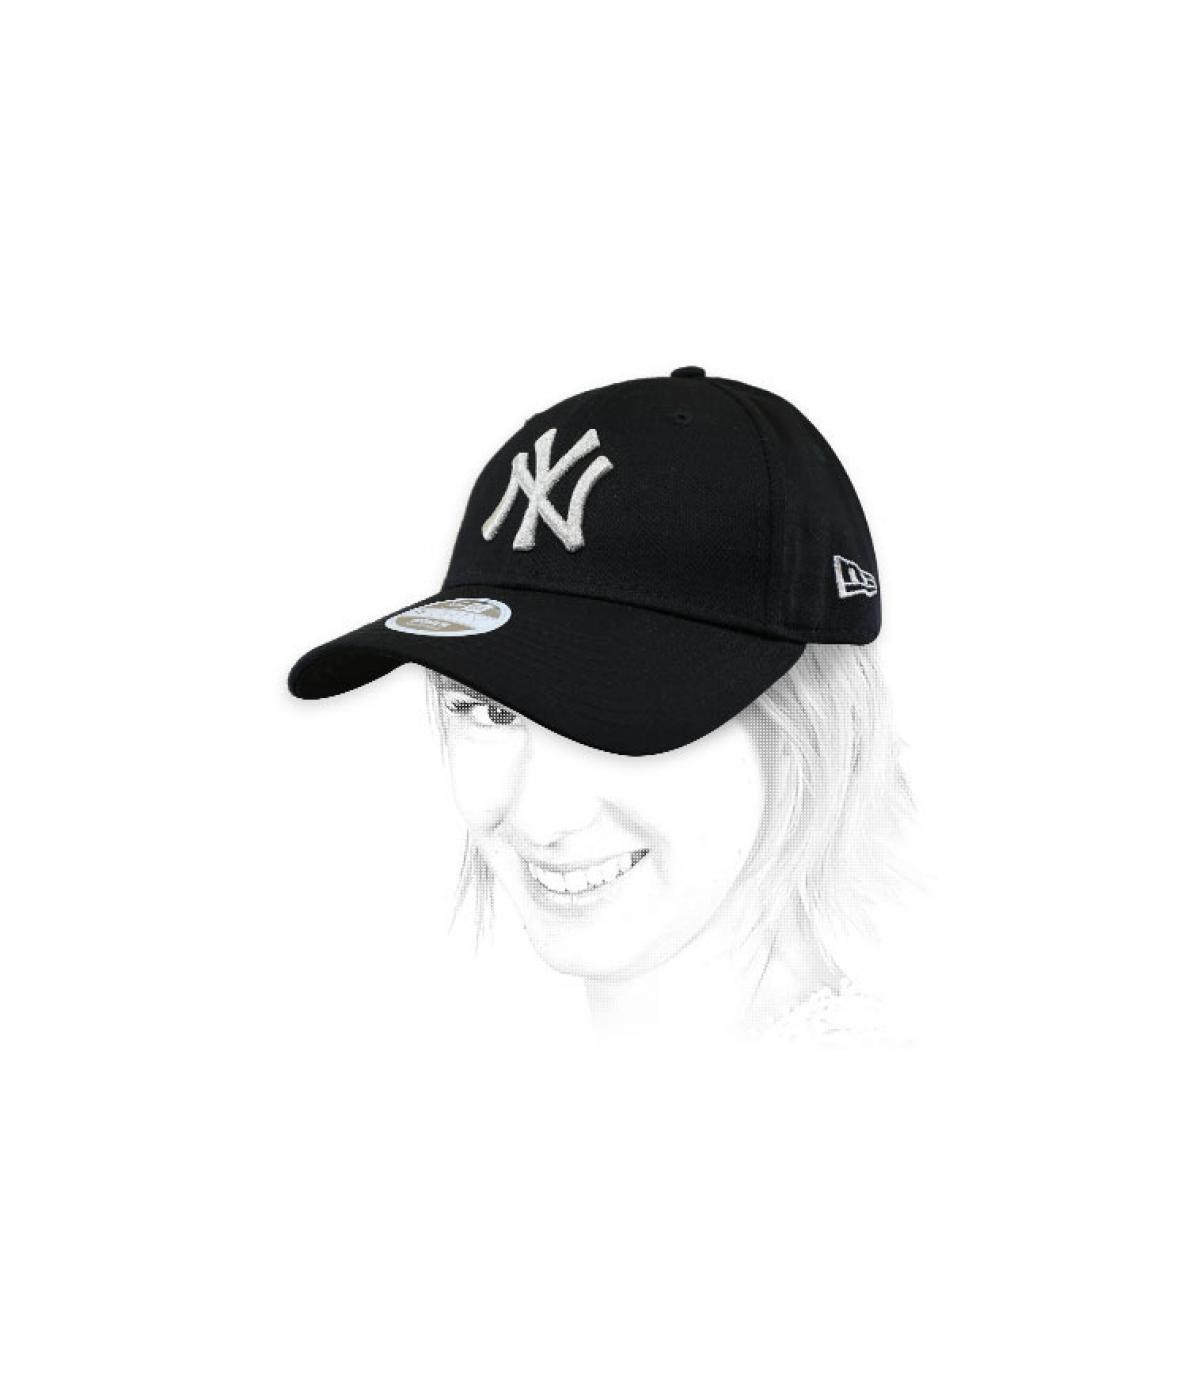 Damen Cap NY schwarz silber